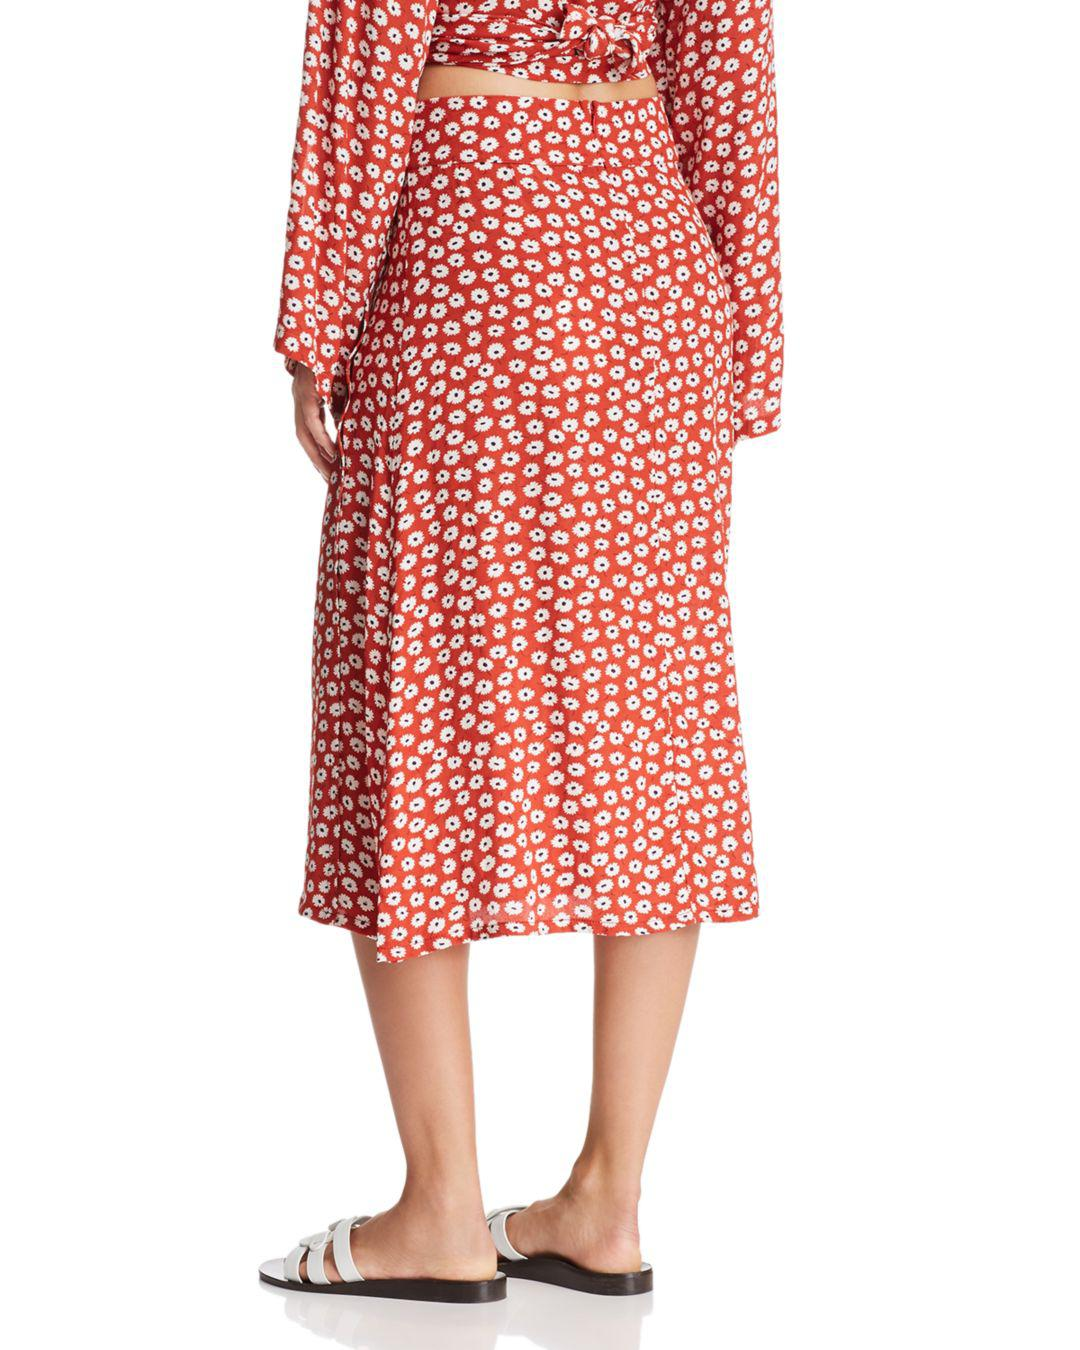 29452ce2ee Faithfull The Brand Joy Floral Midi Skirt in Red - Lyst